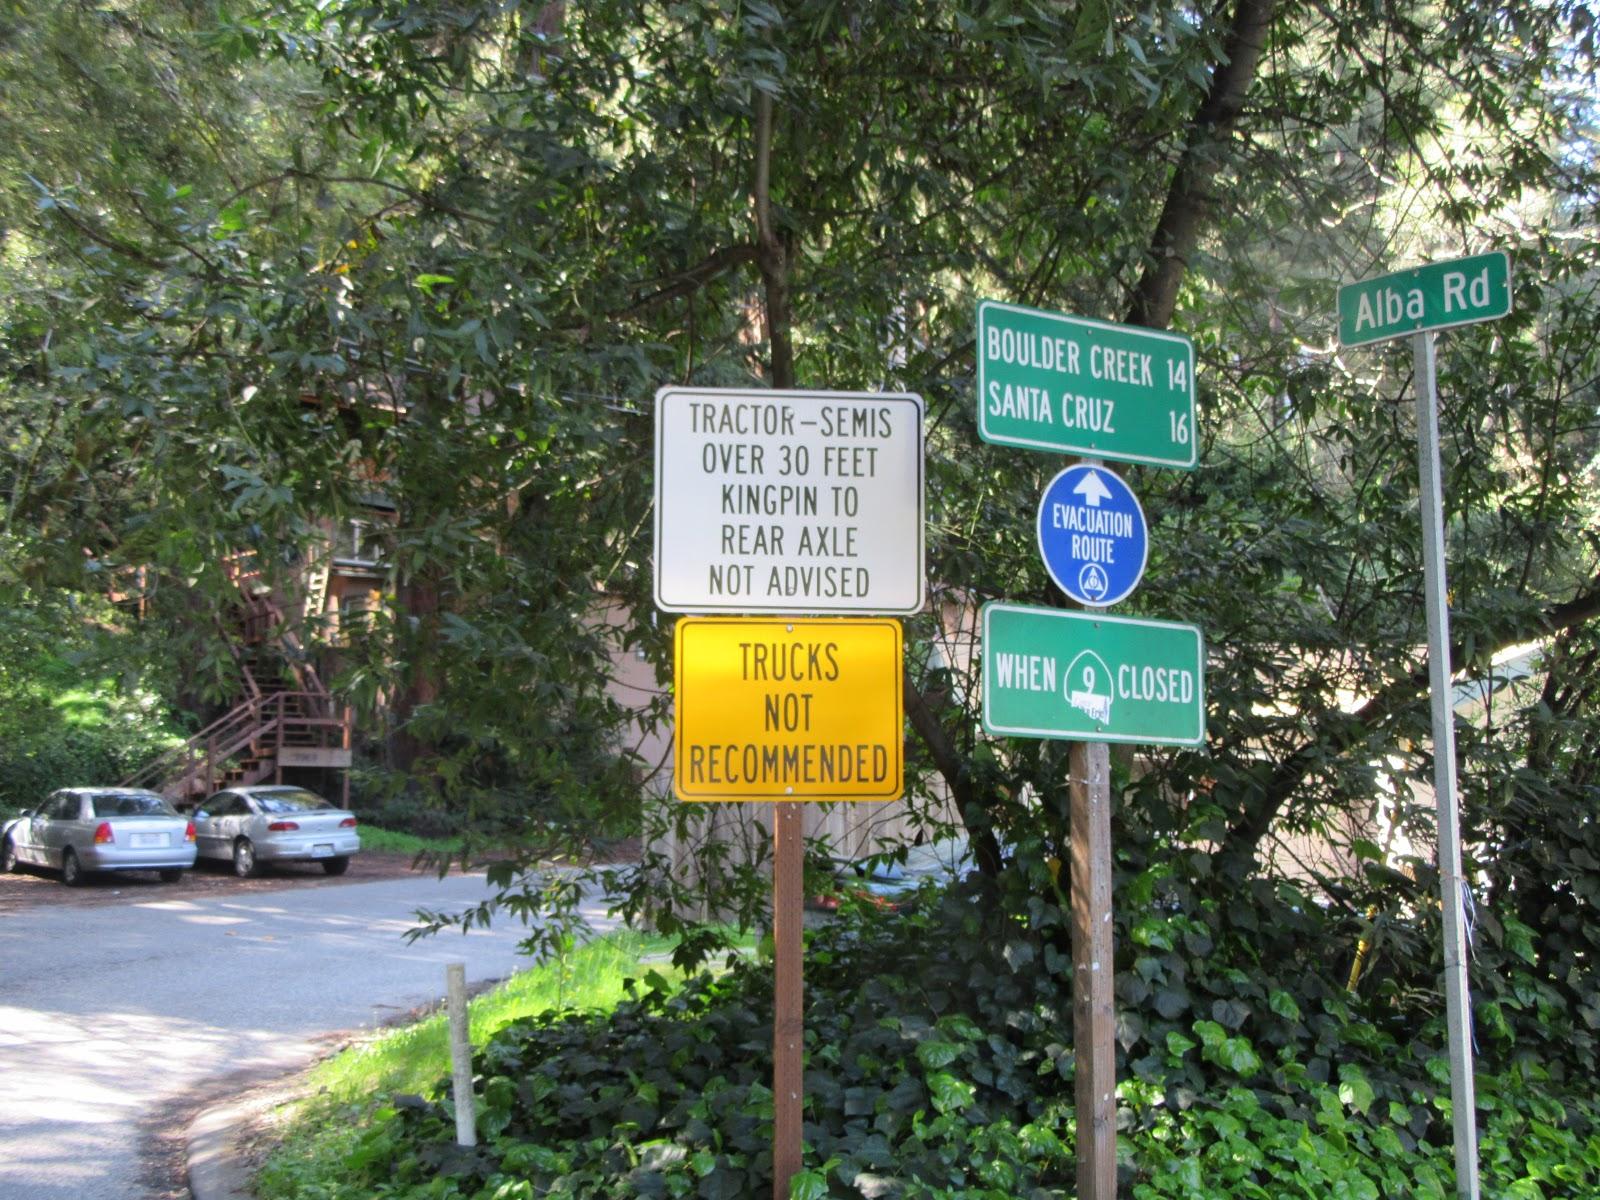 Beginning of the Alba Road climb by bike, Ben Lomond, Santa Cruz County